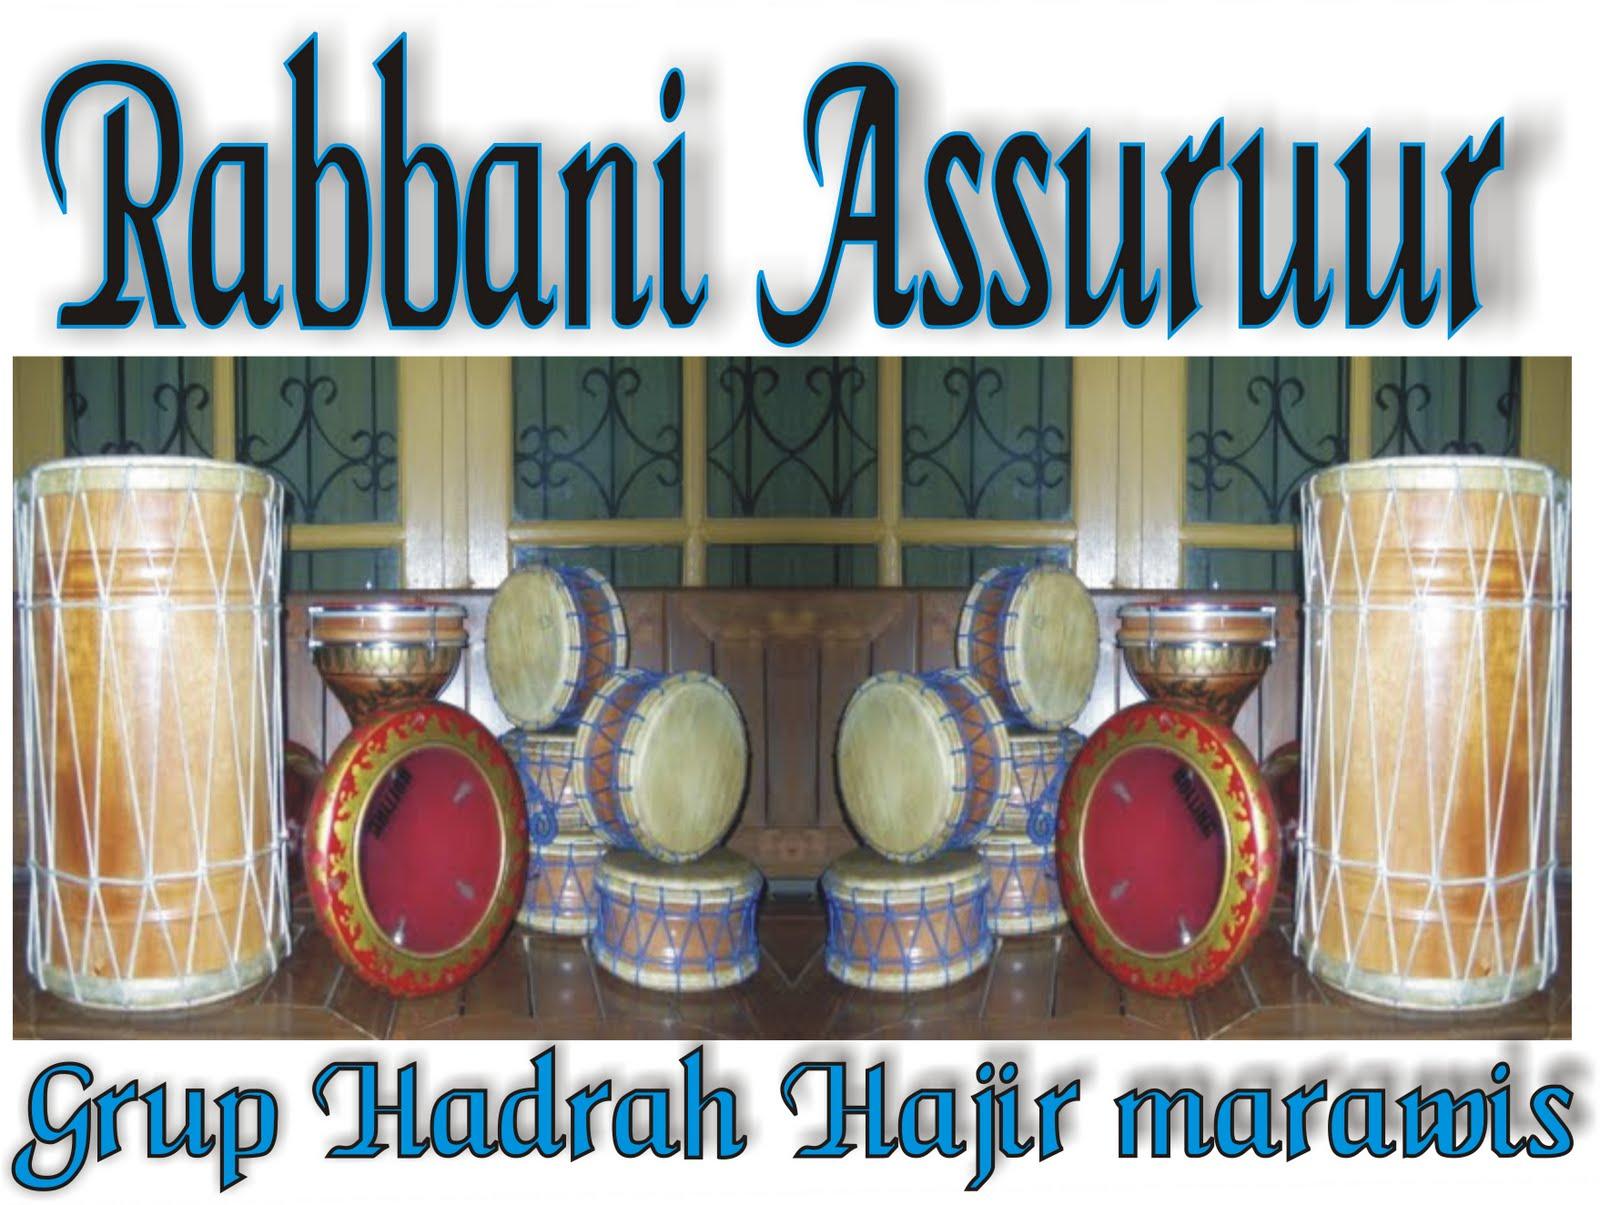 Rabbani Assuruur